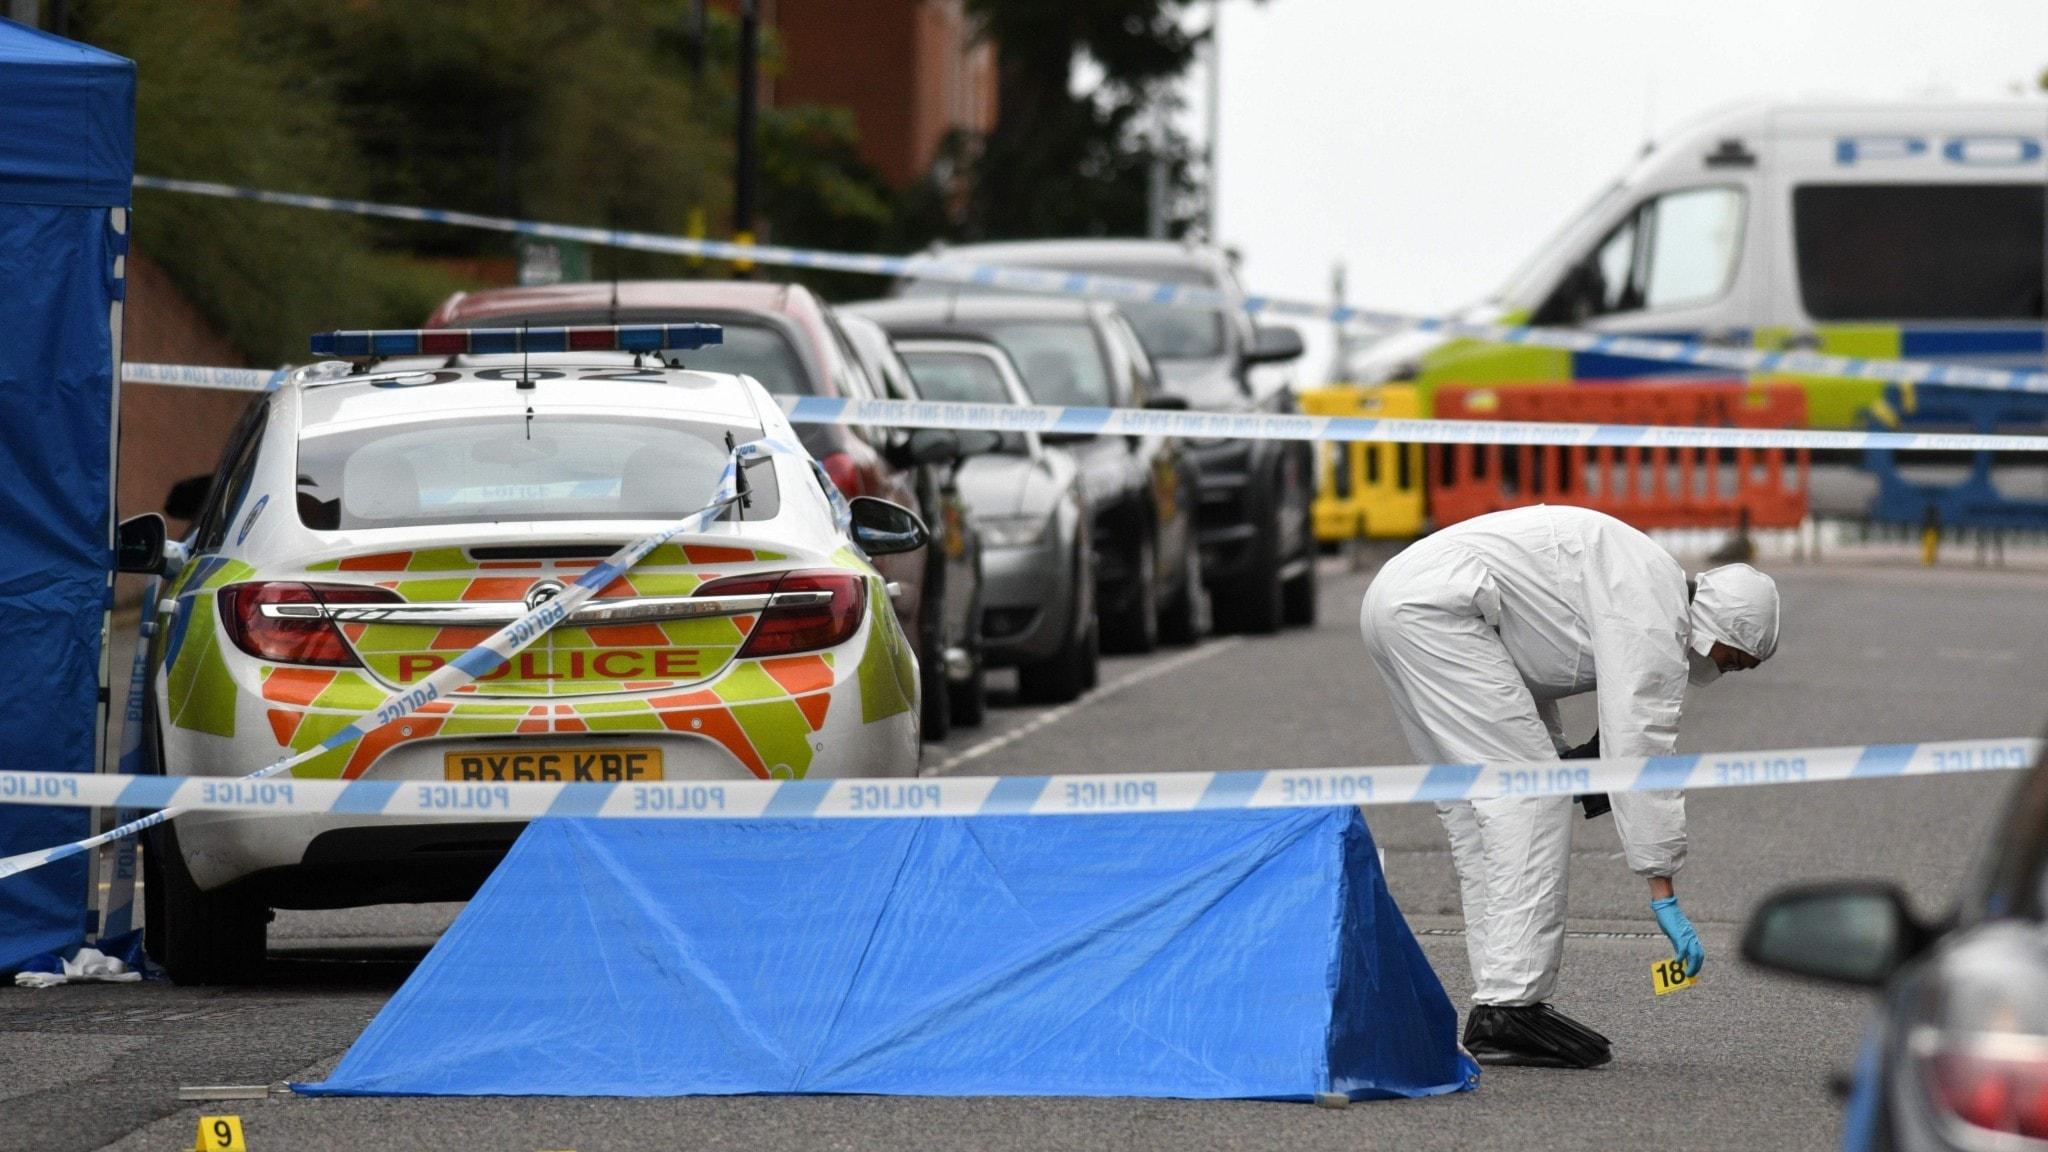 Flera larm om knivdåd i Birmingham